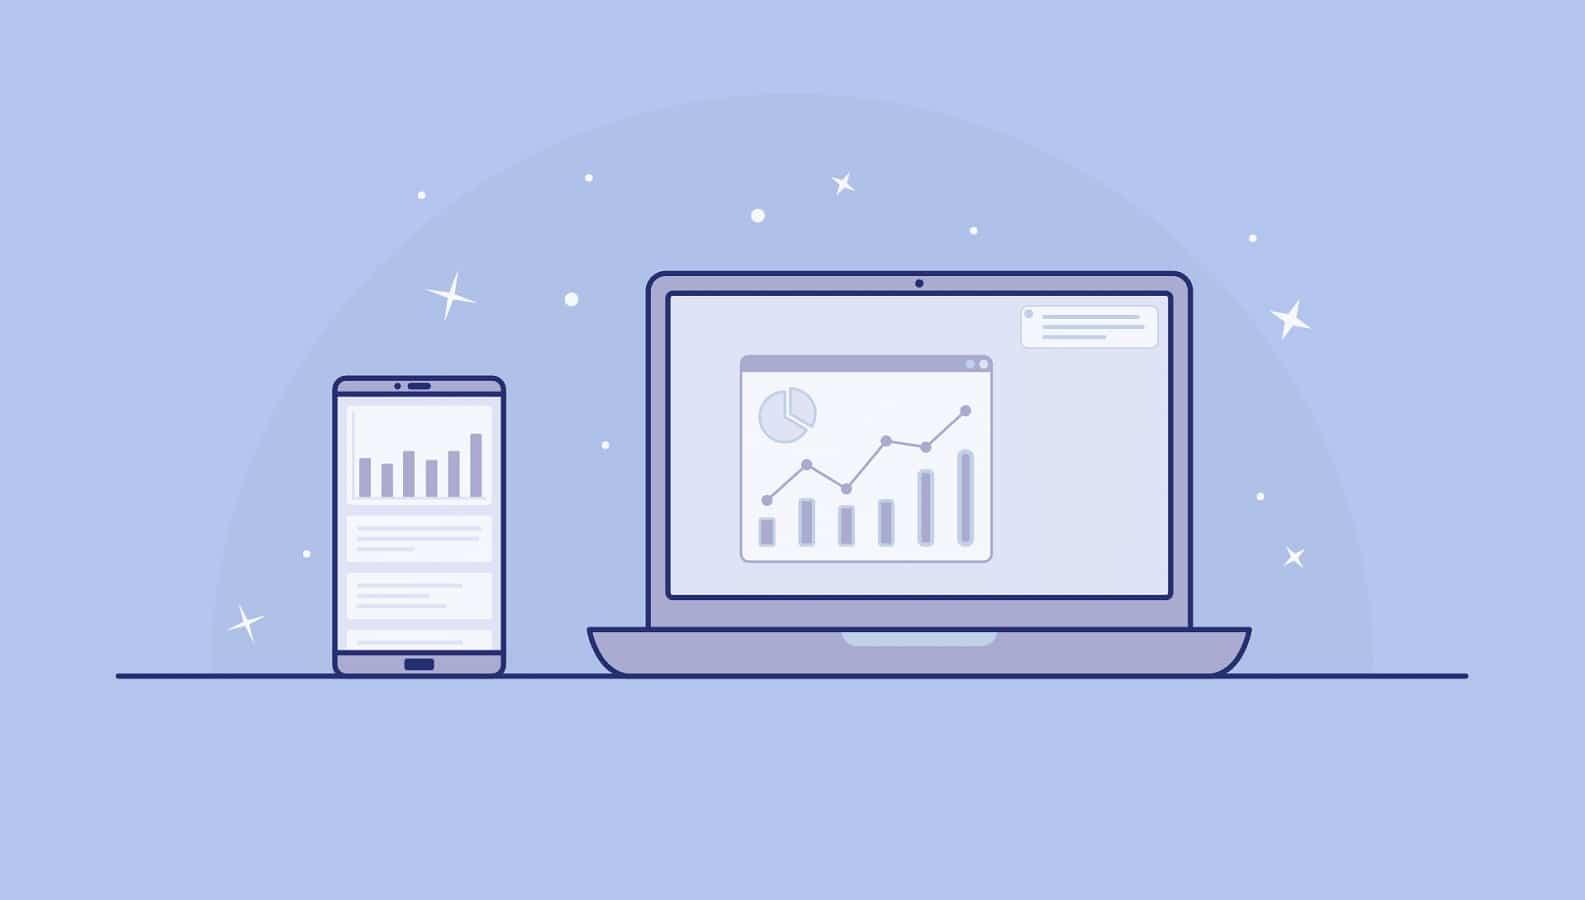 data on multiple screens